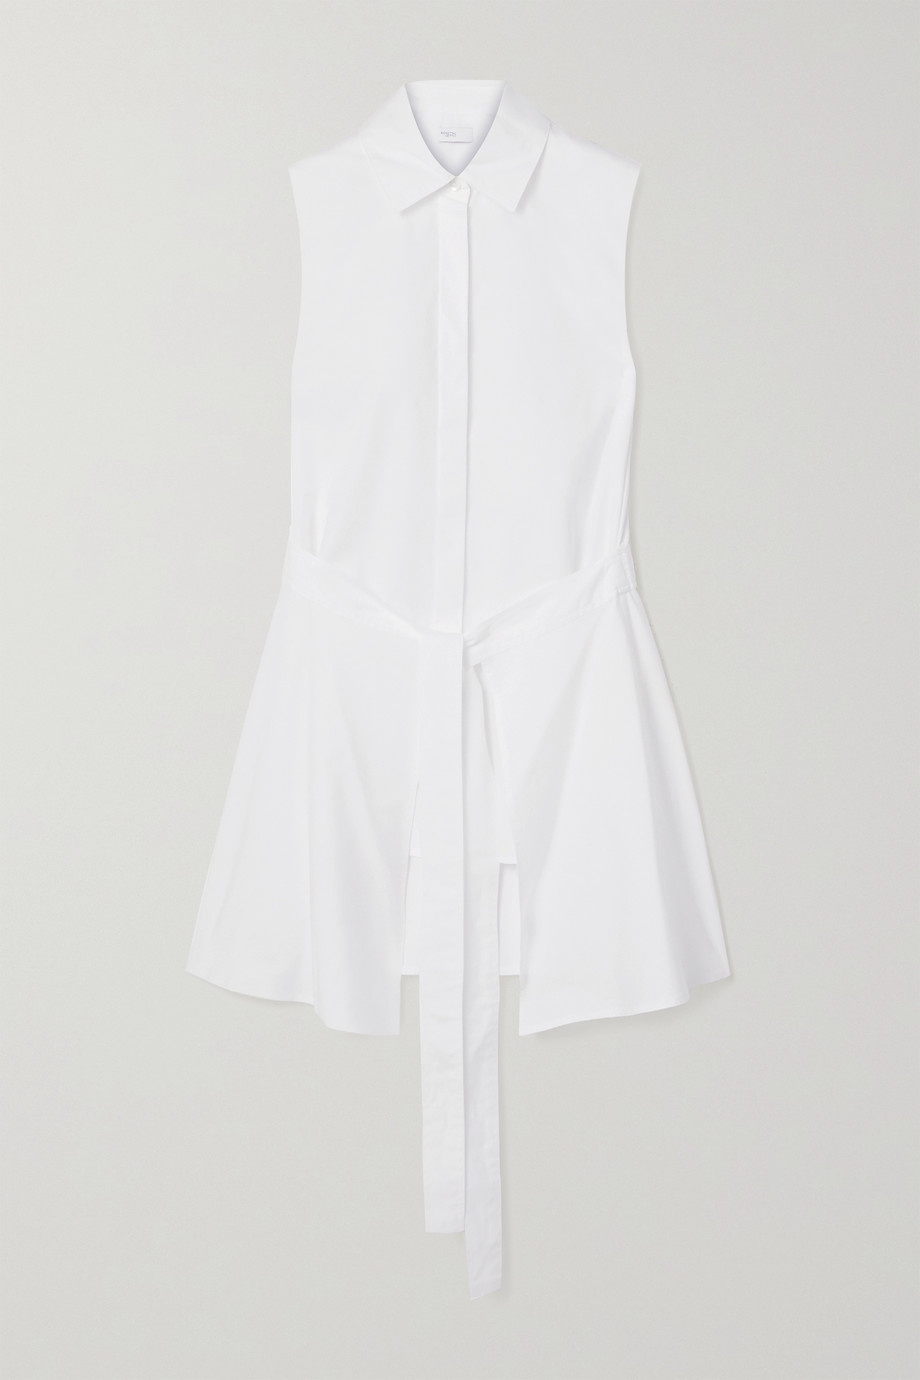 Rosetta Getty Tie-front cotton-poplin shirt